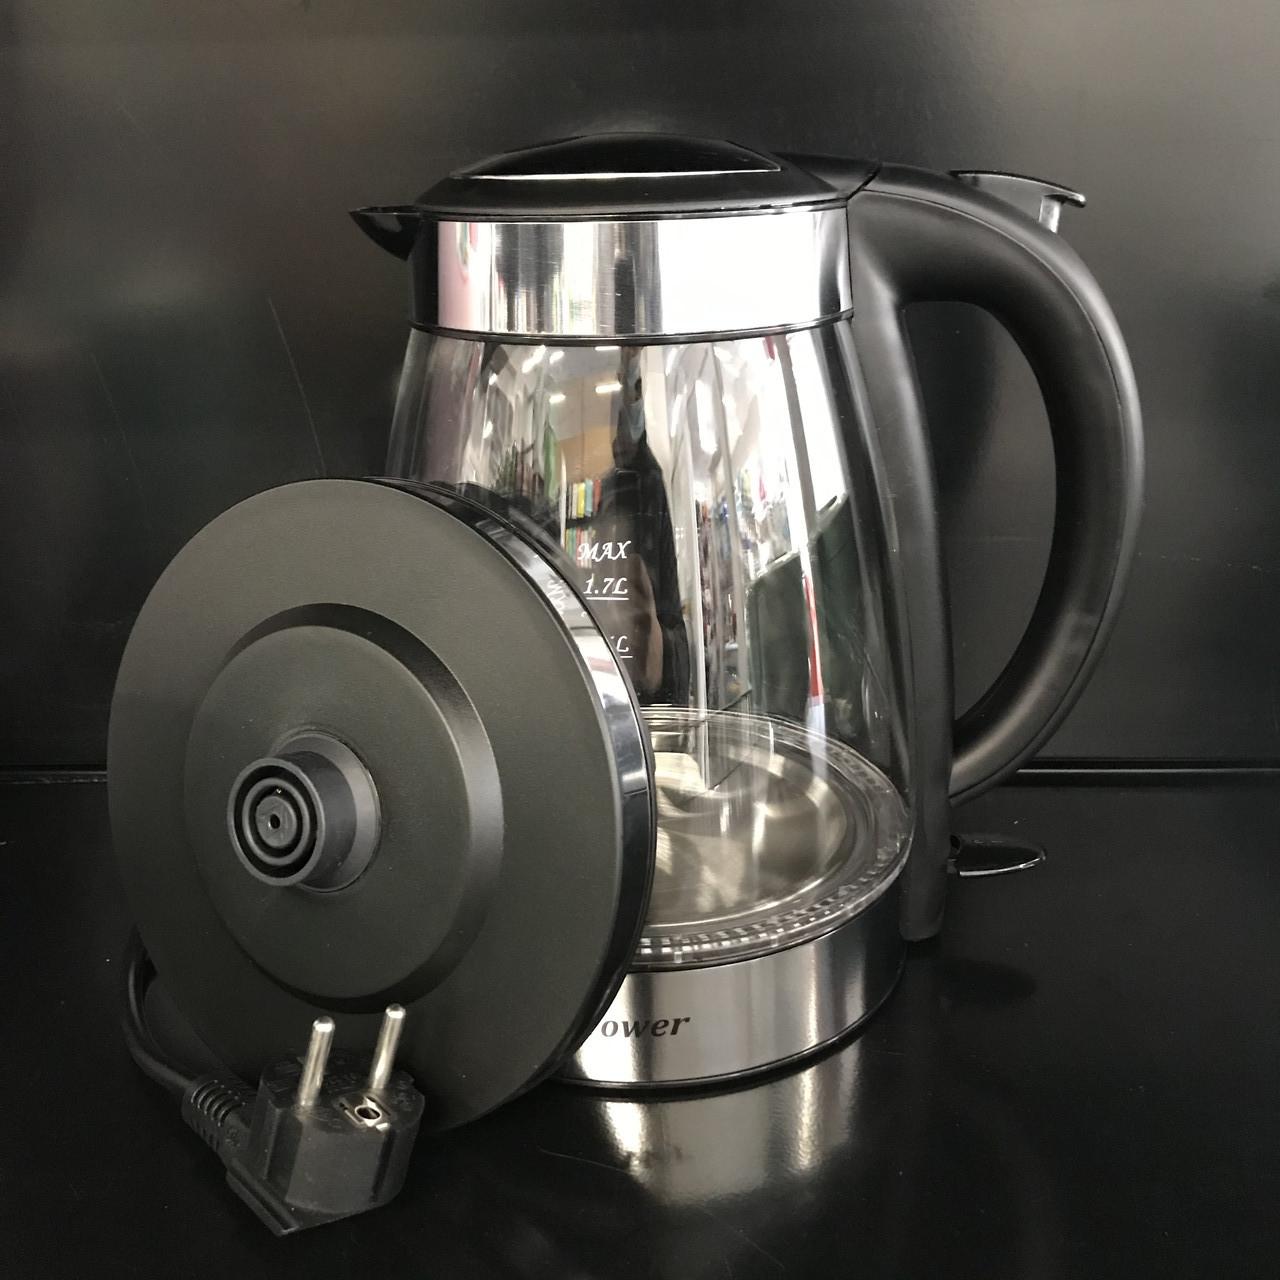 Электрический чайник. TriTower 2,2 L. - фото 3